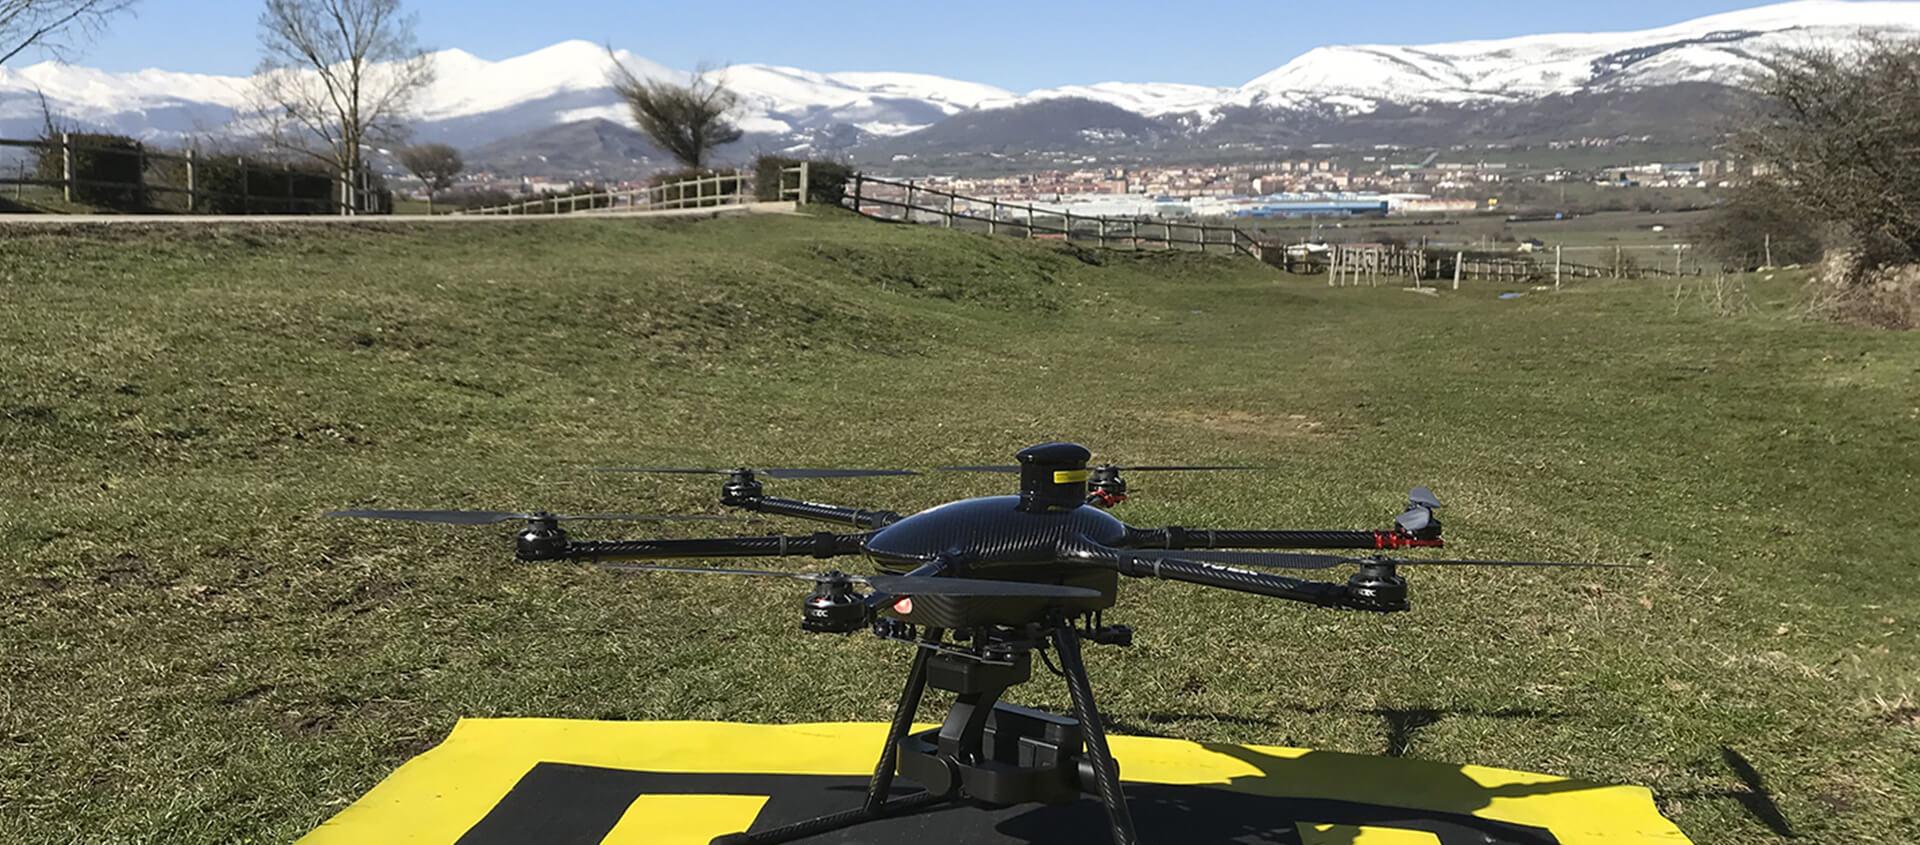 home_superior_drones_slider_bg